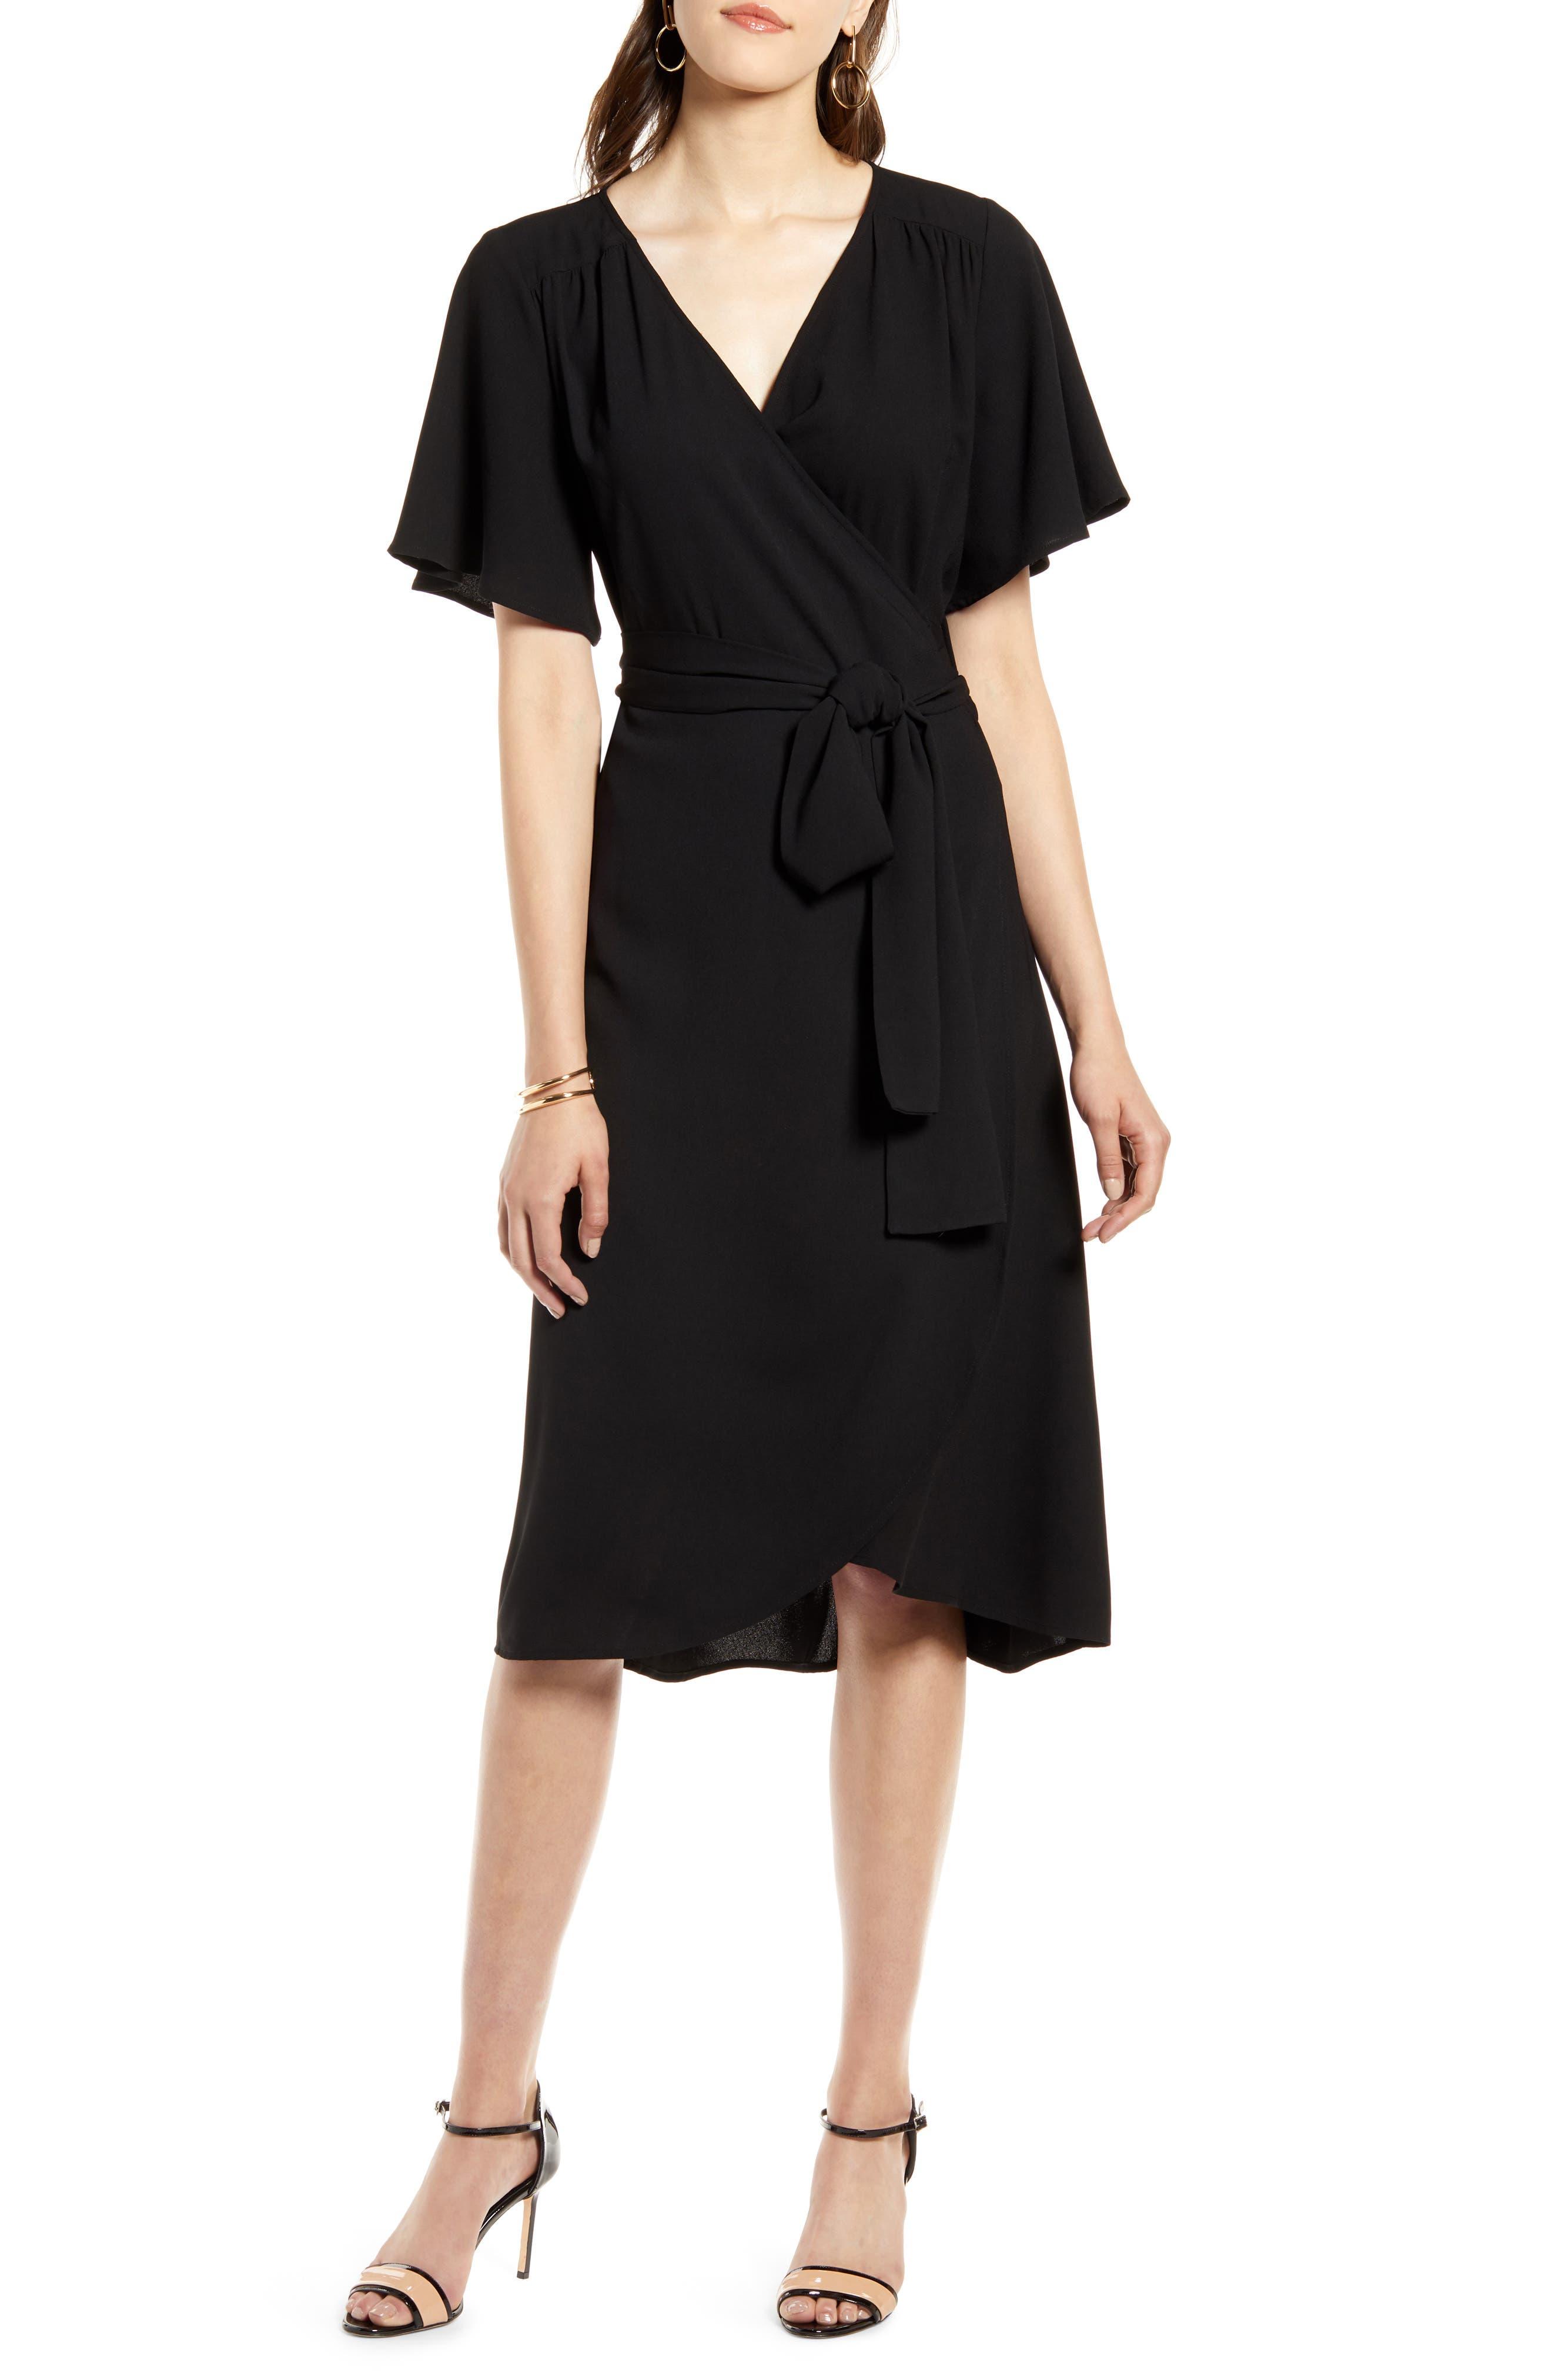 Vintage Cocktail Dresses, Party Dresses, Prom Dresses Womens Halogen Wrap Dress Size Small - Black $53.40 AT vintagedancer.com